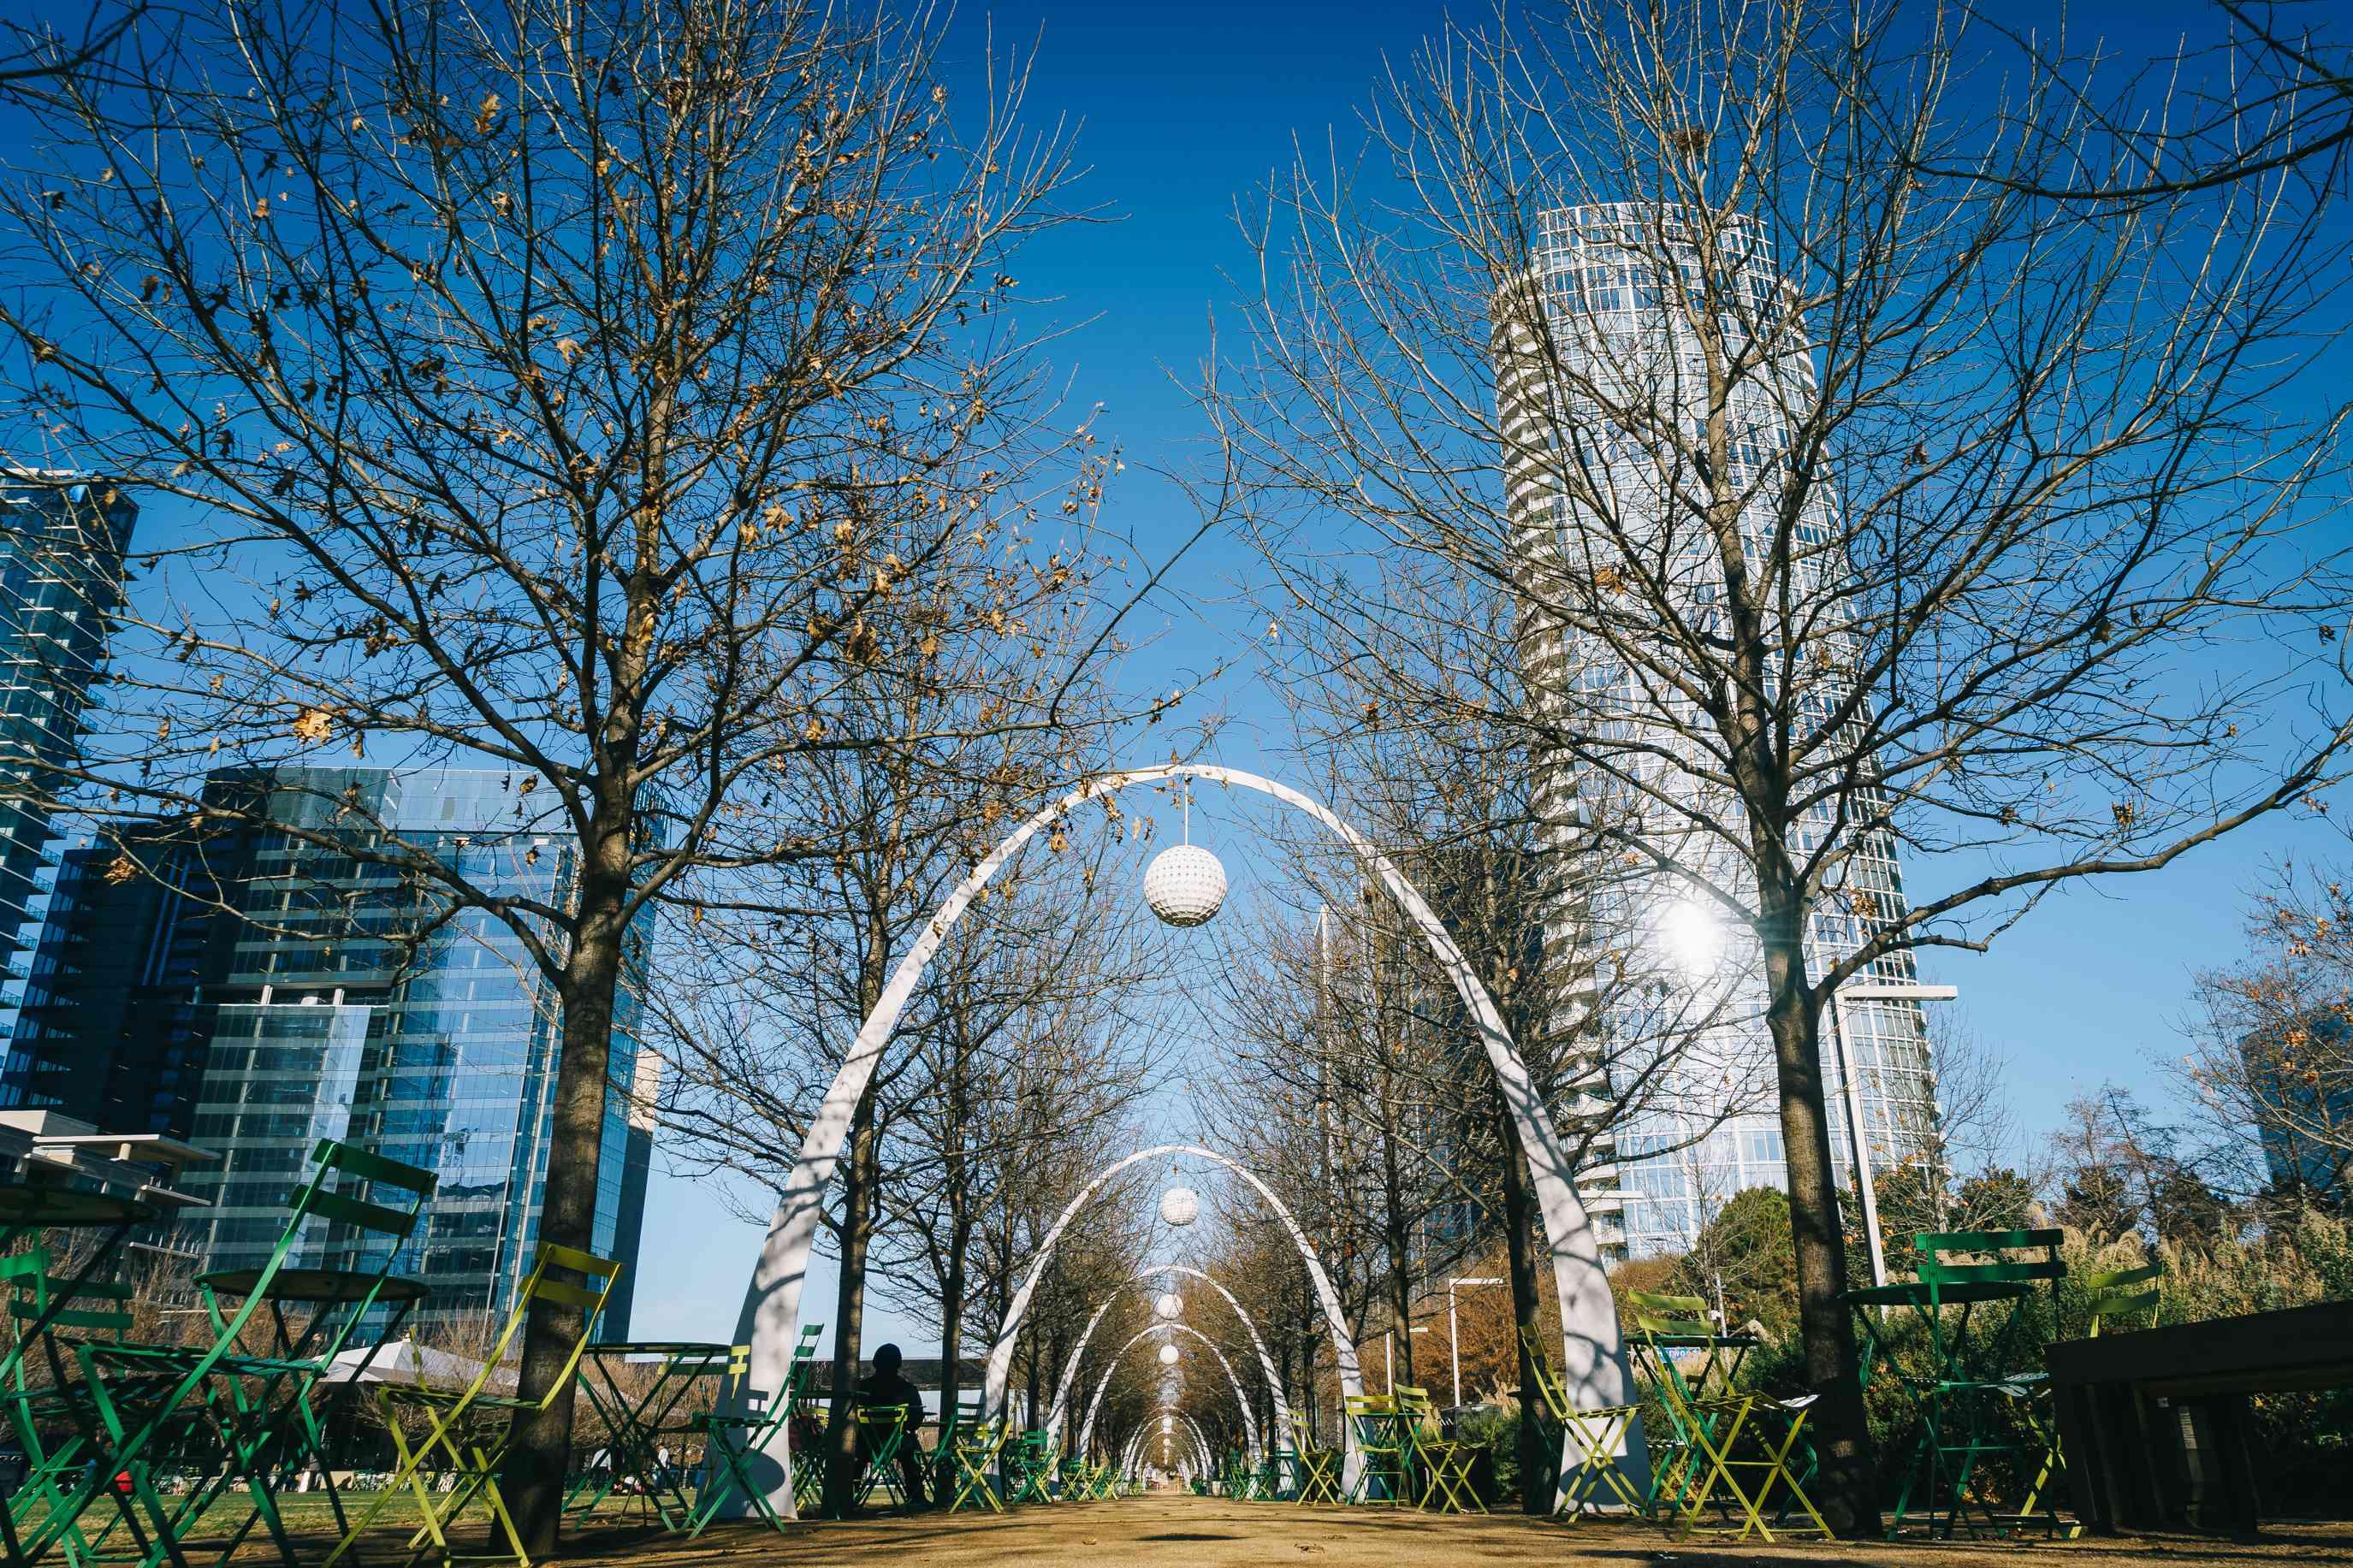 Series of white arches in Klyde Warren Park during autumn